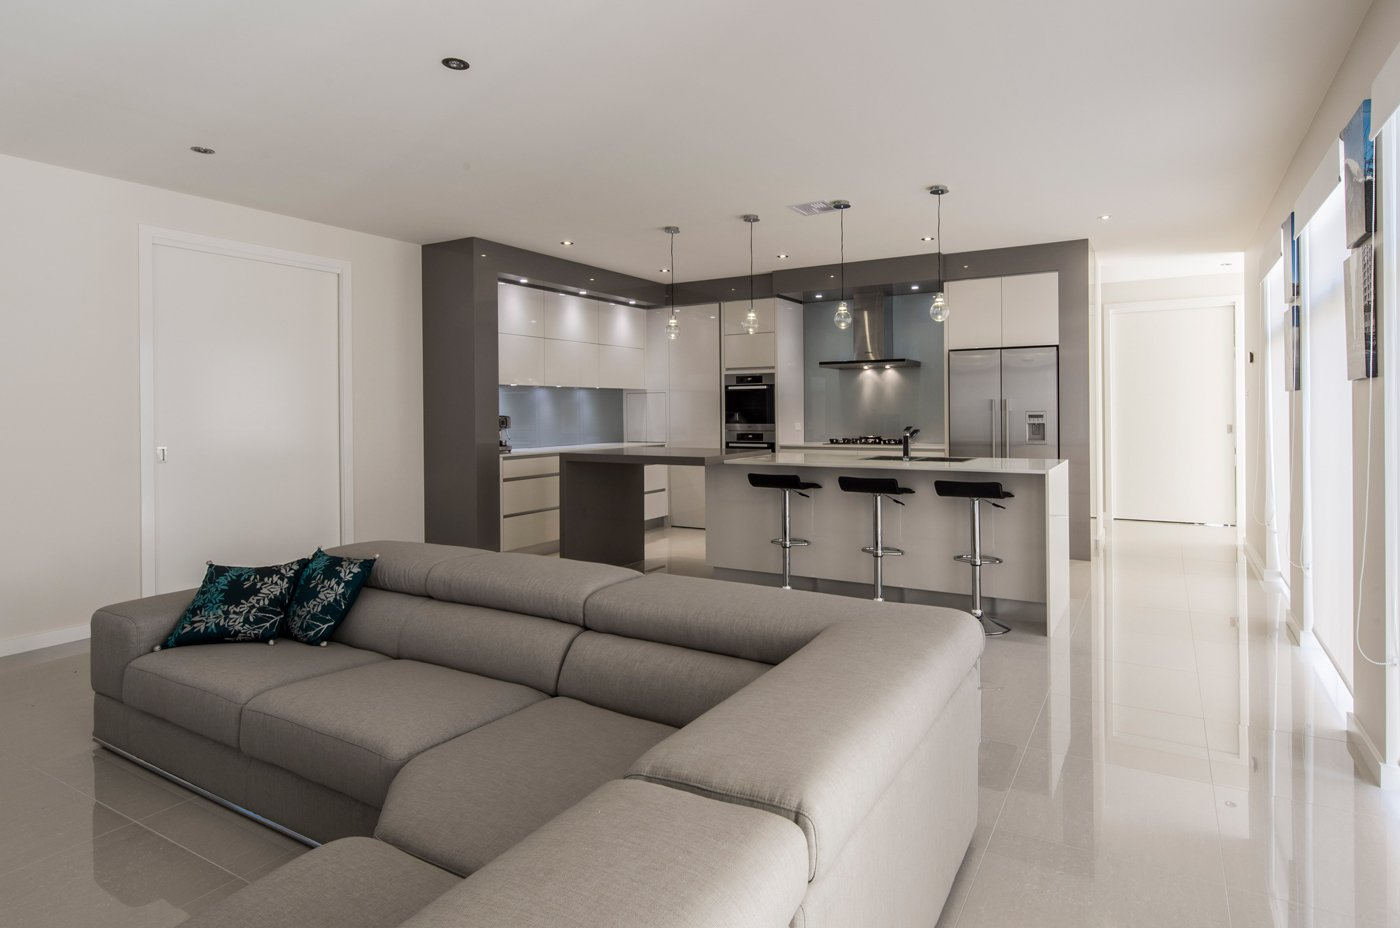 Quality designer kitchens